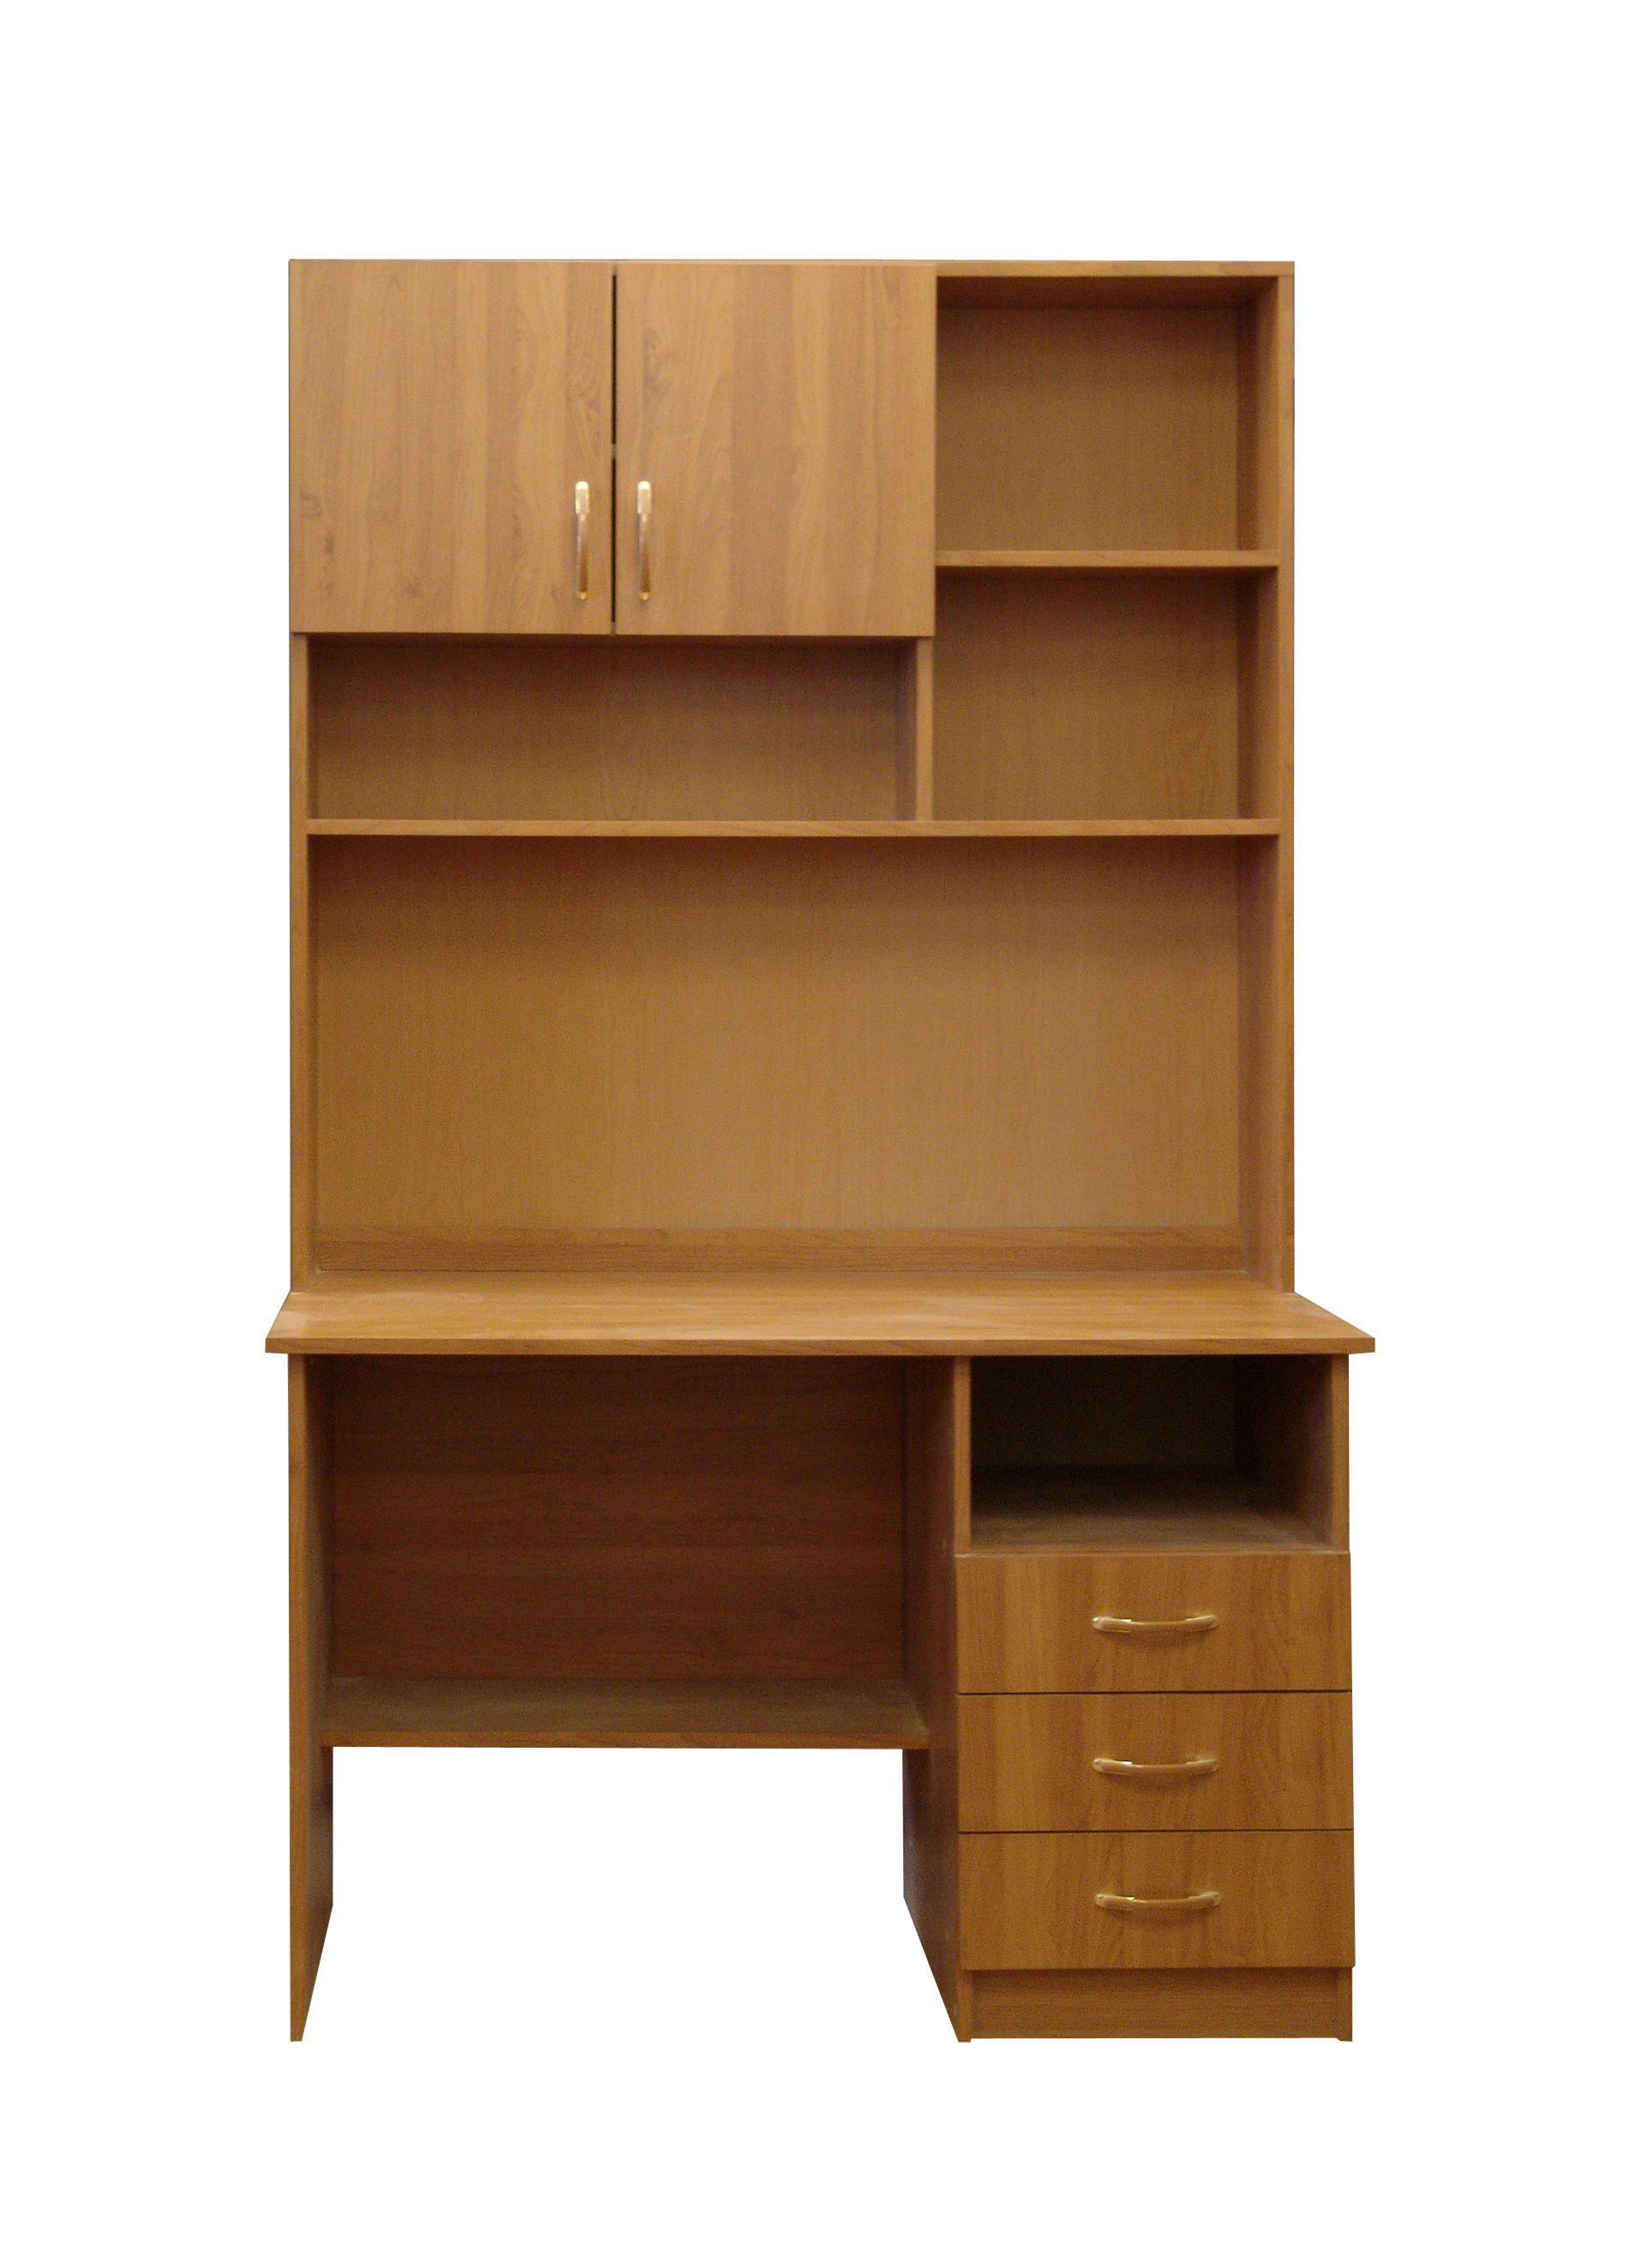 Письменный стол-стенка Елена-1 ТЕКО